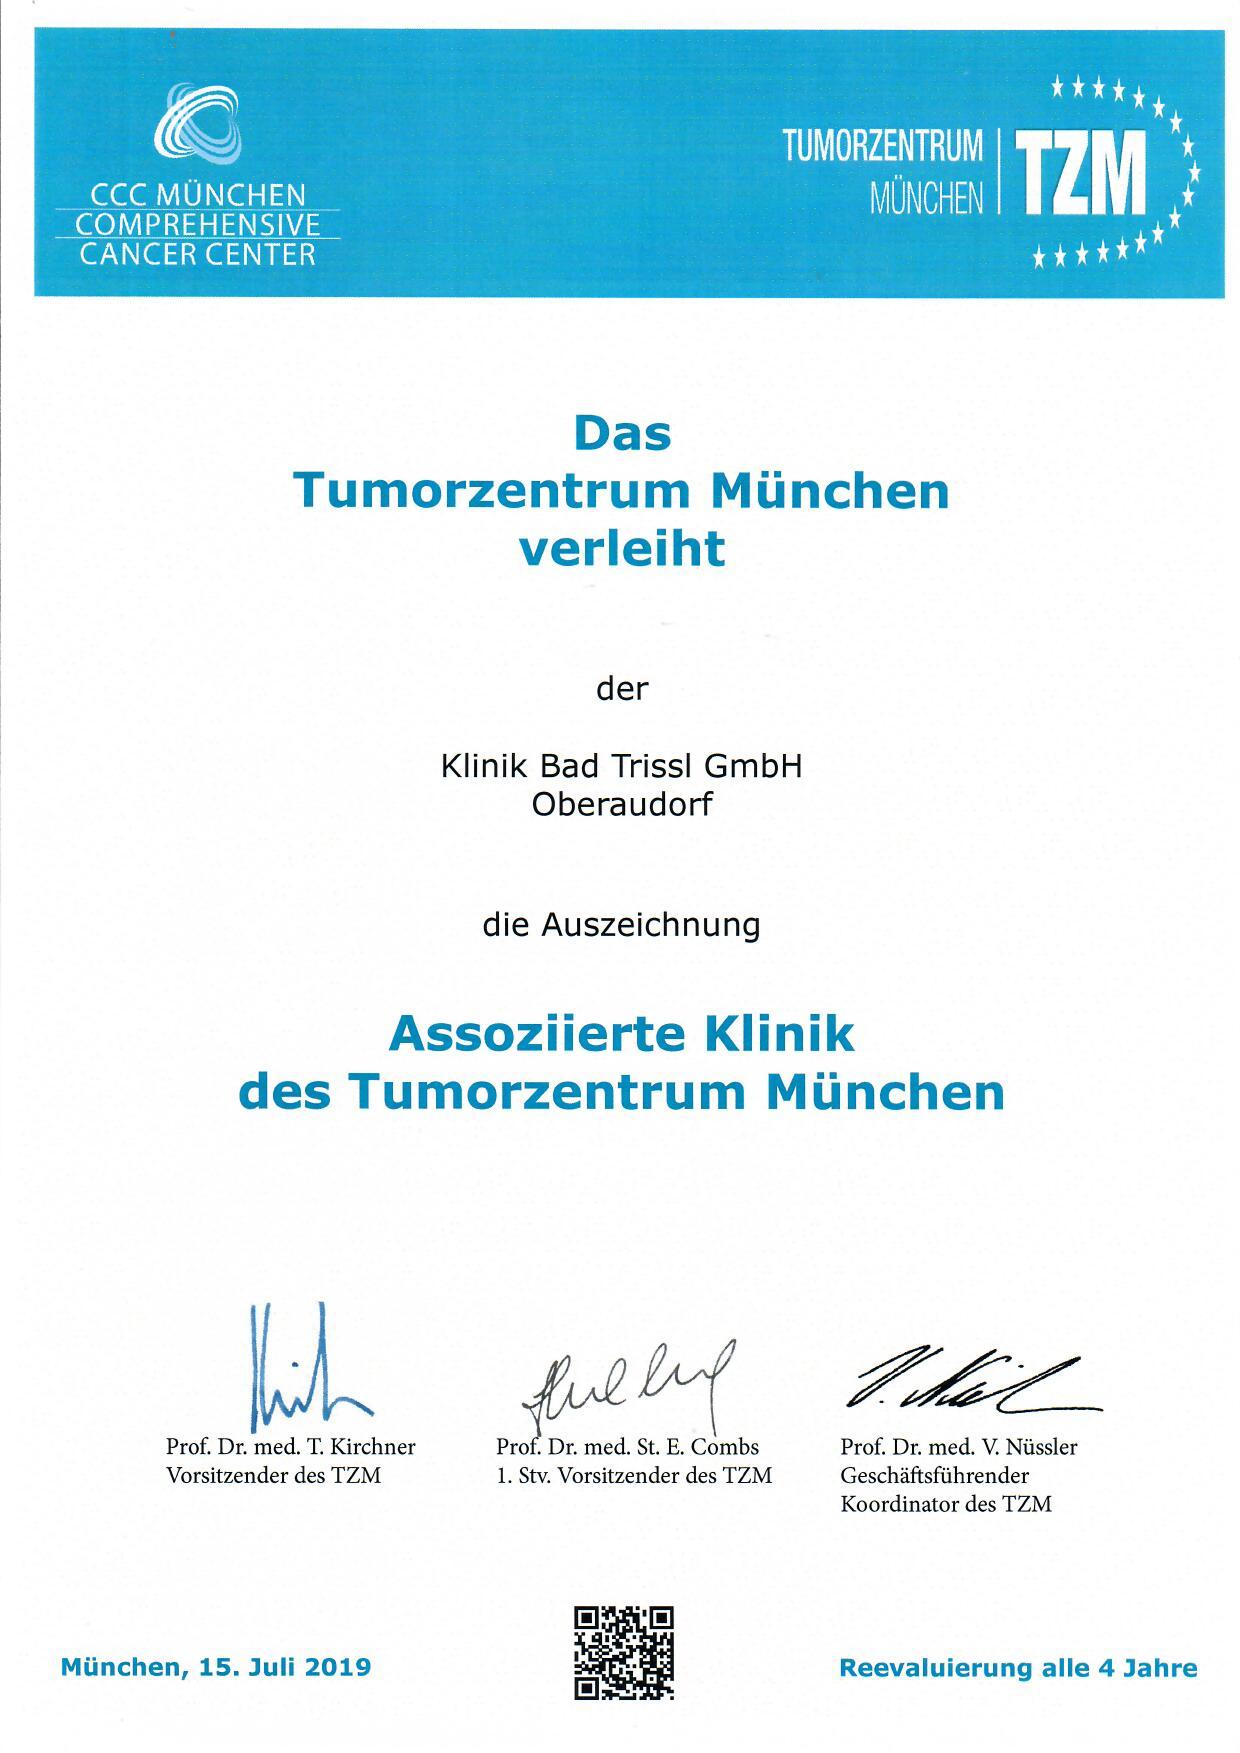 Zertifikat - Tumorzentrum München